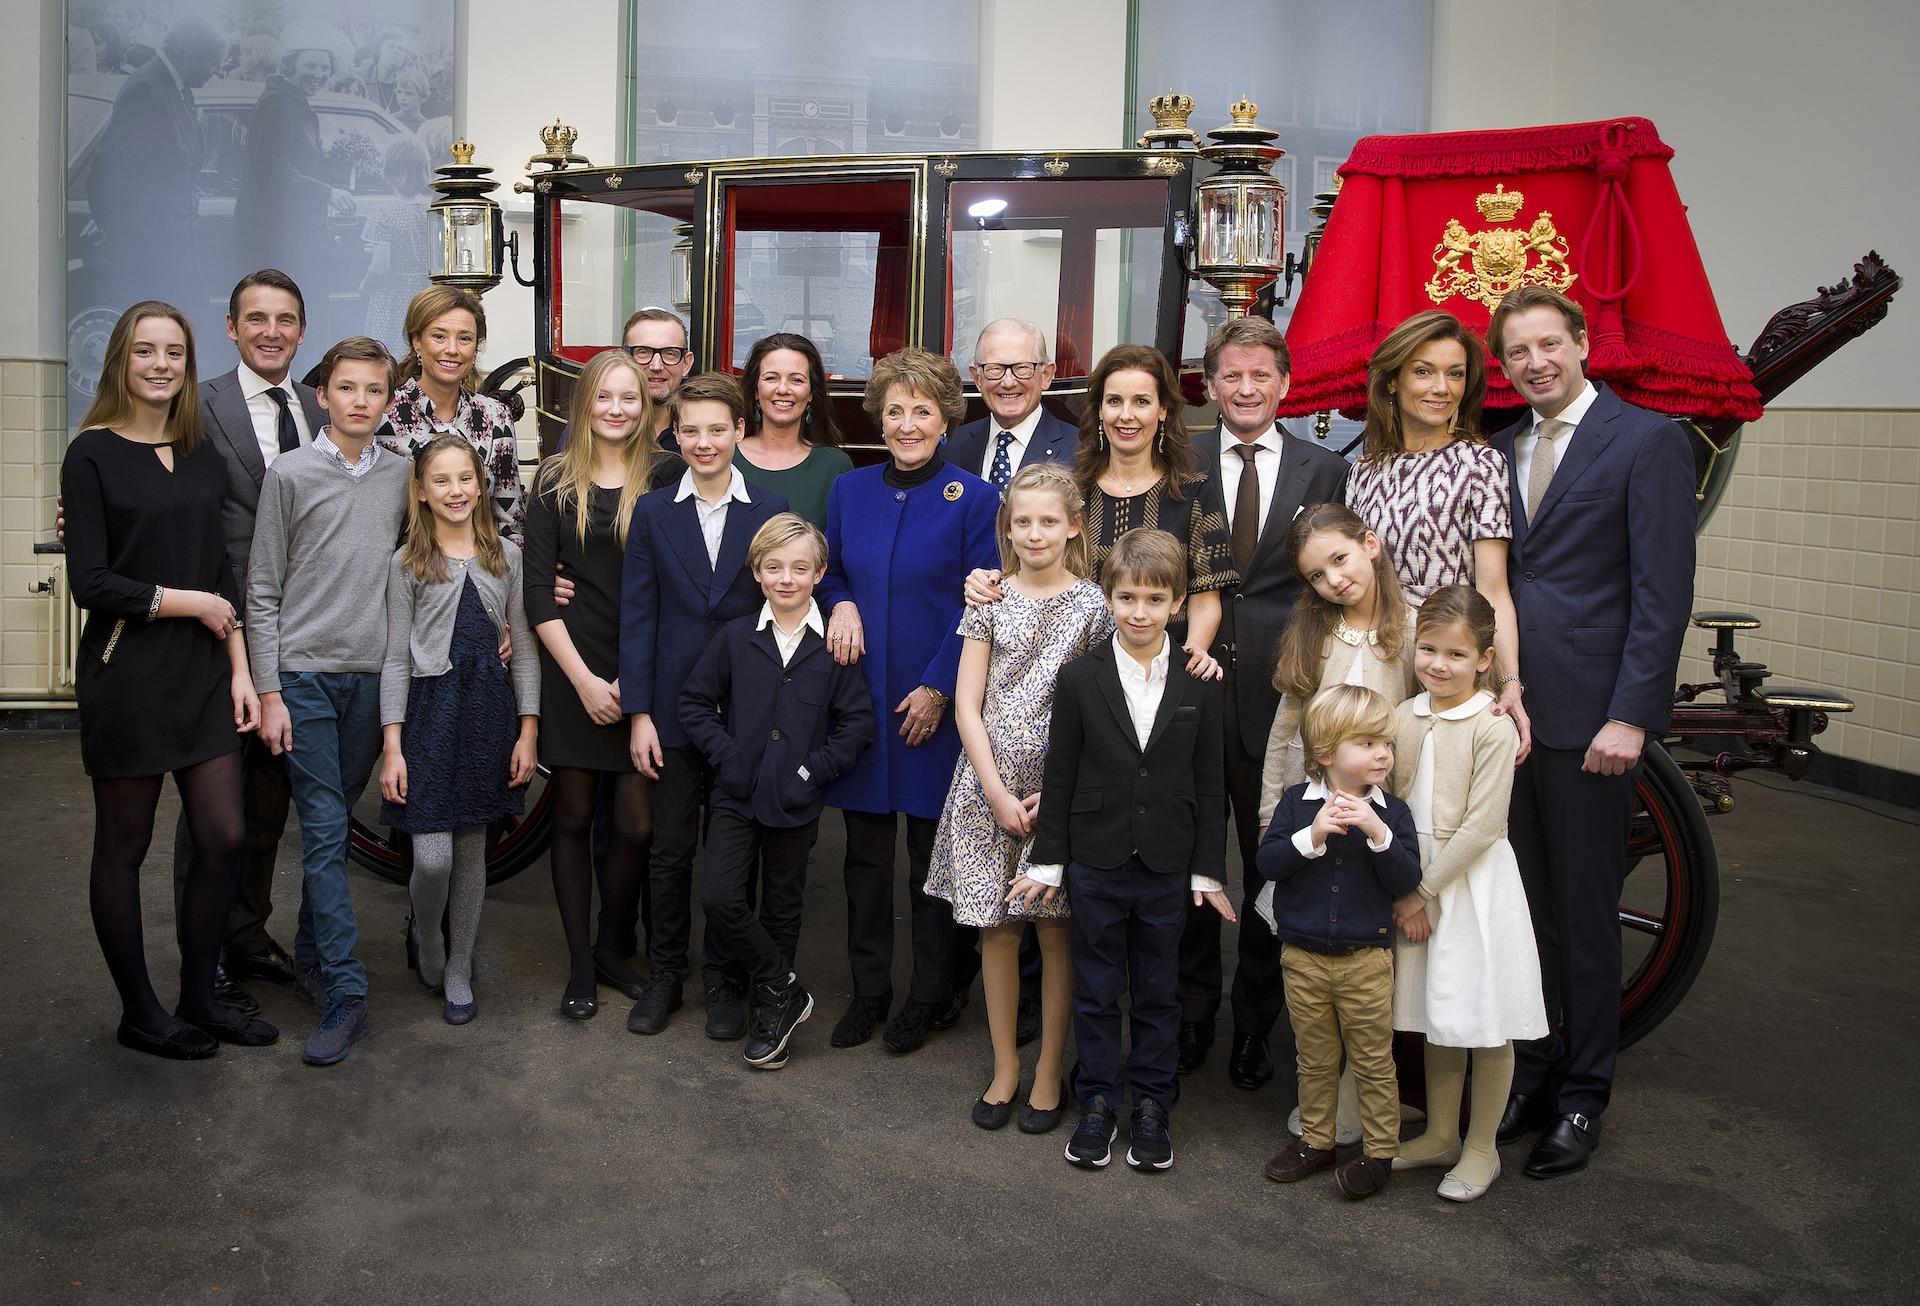 Familie Prinzessin Margriet